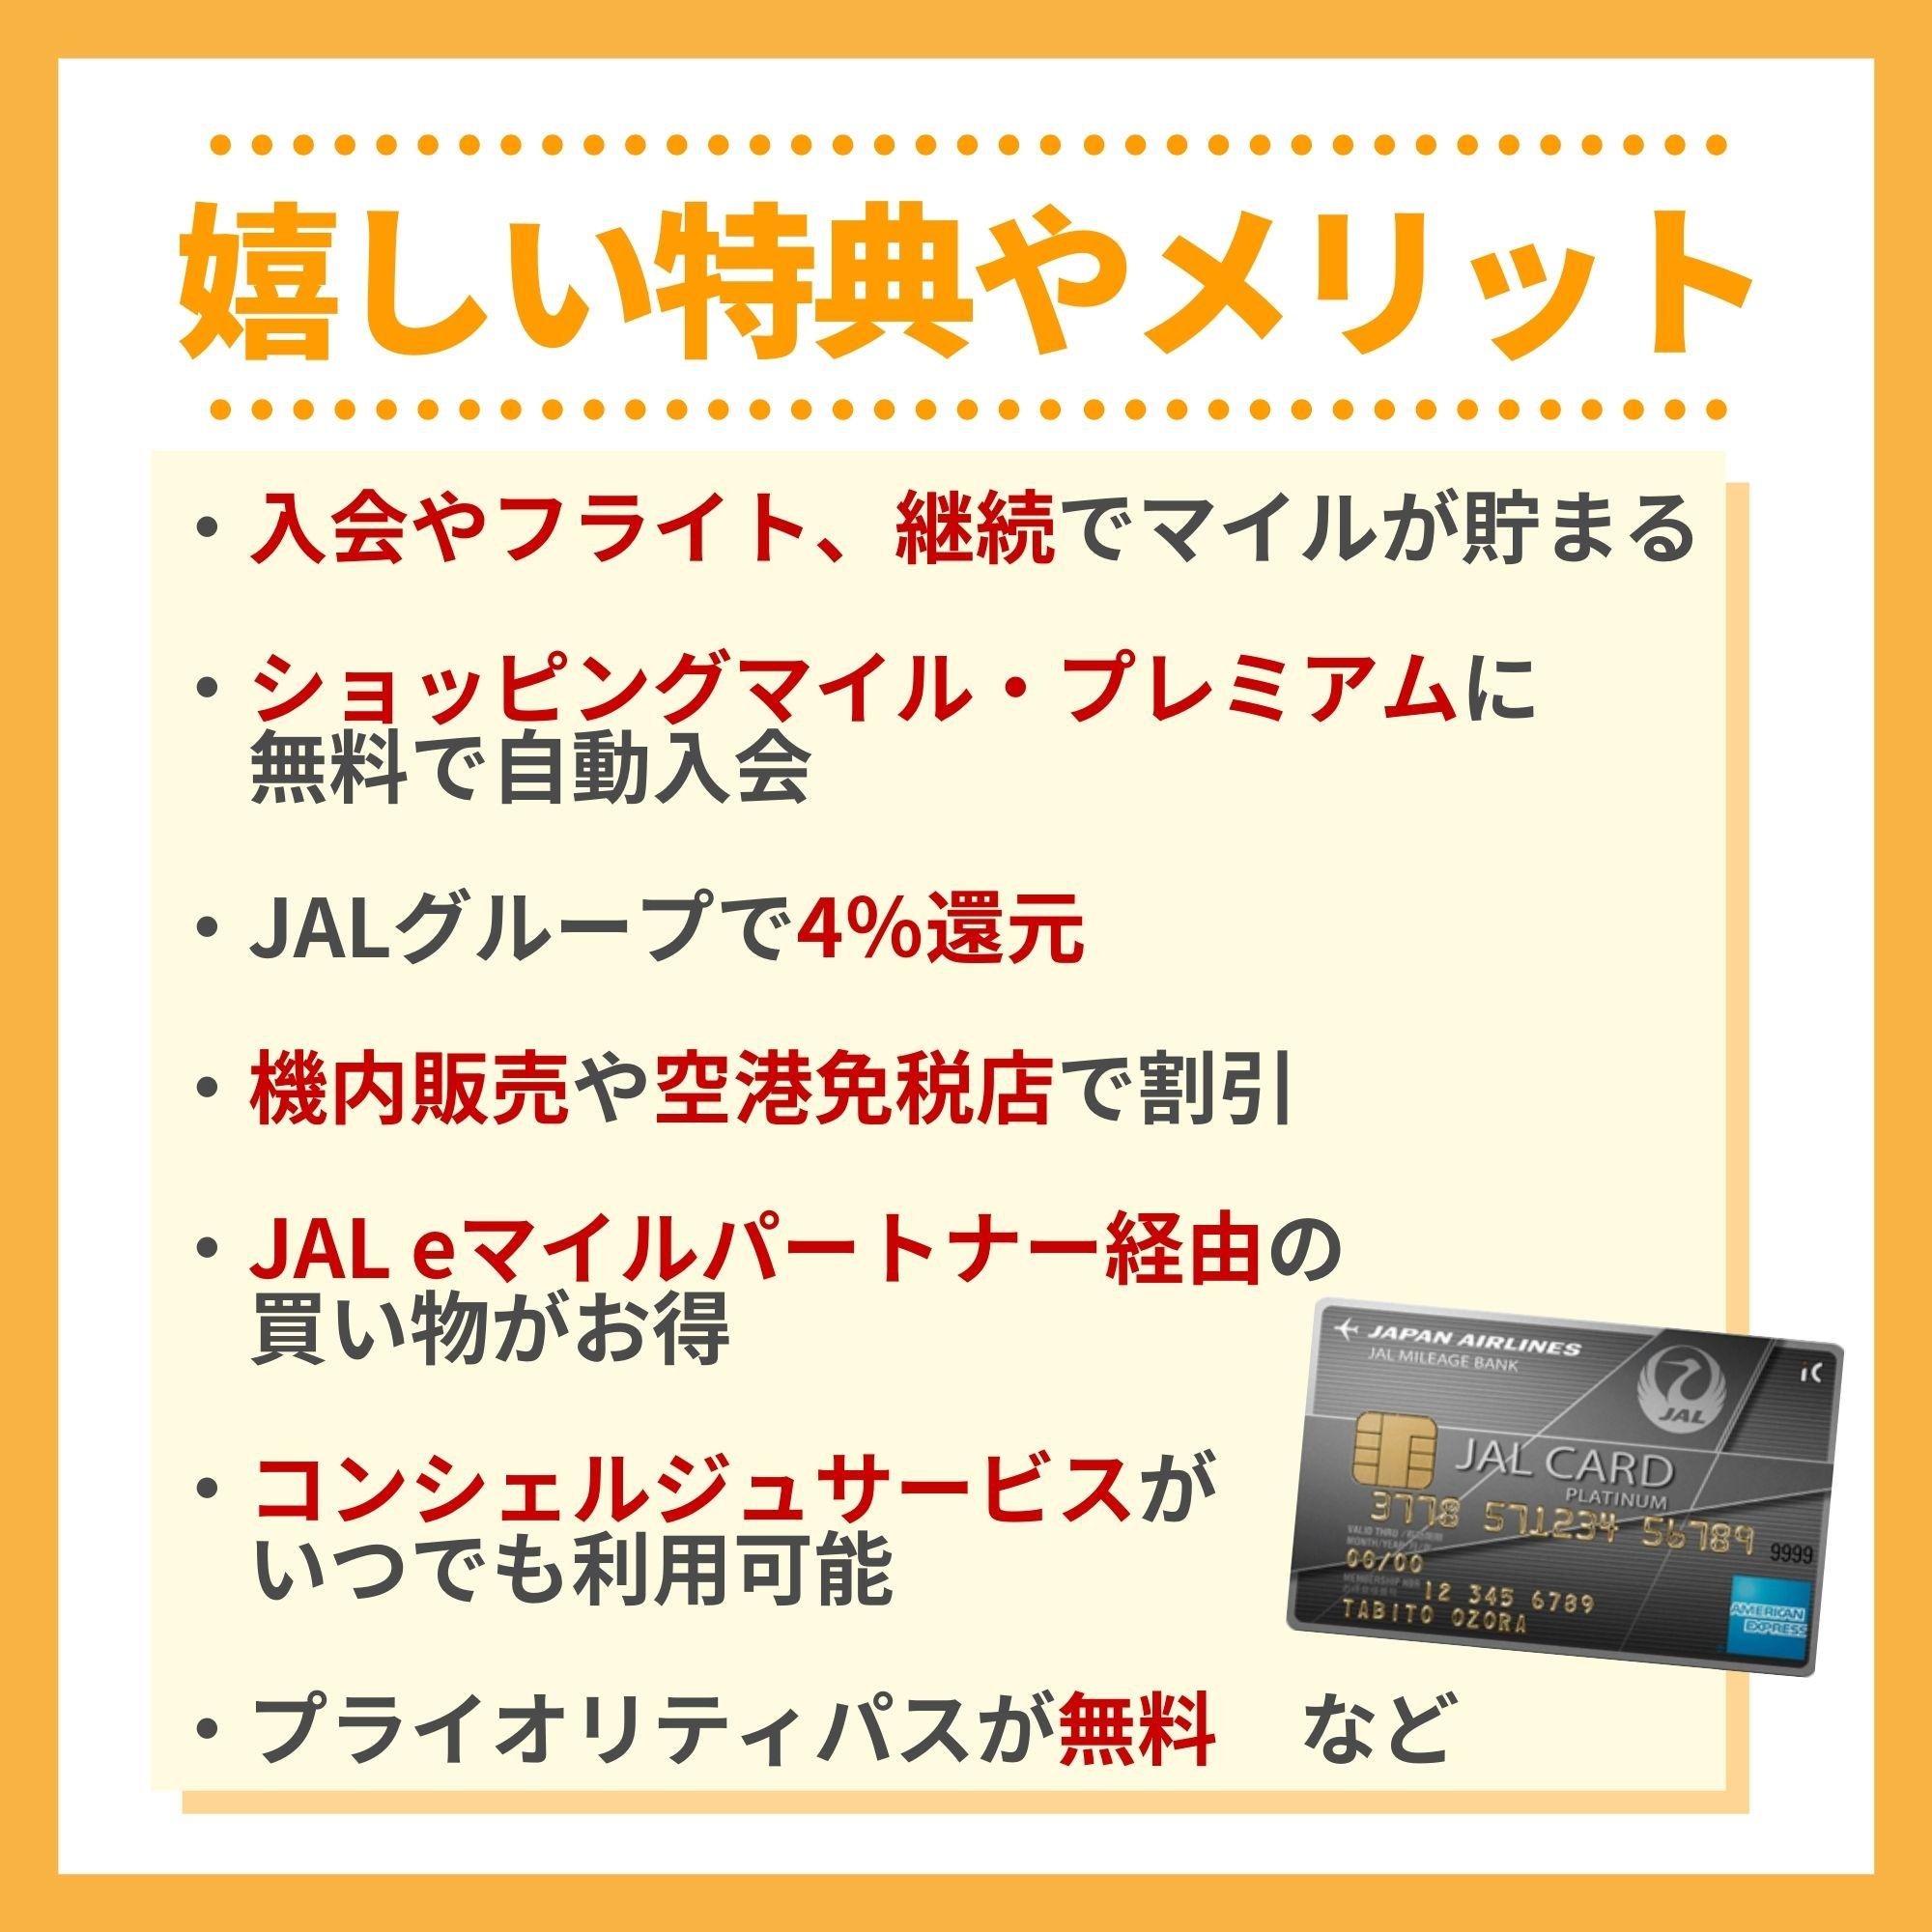 JAL アメリカン・エキスプレス・カードプラチナの特典や補償は充実!